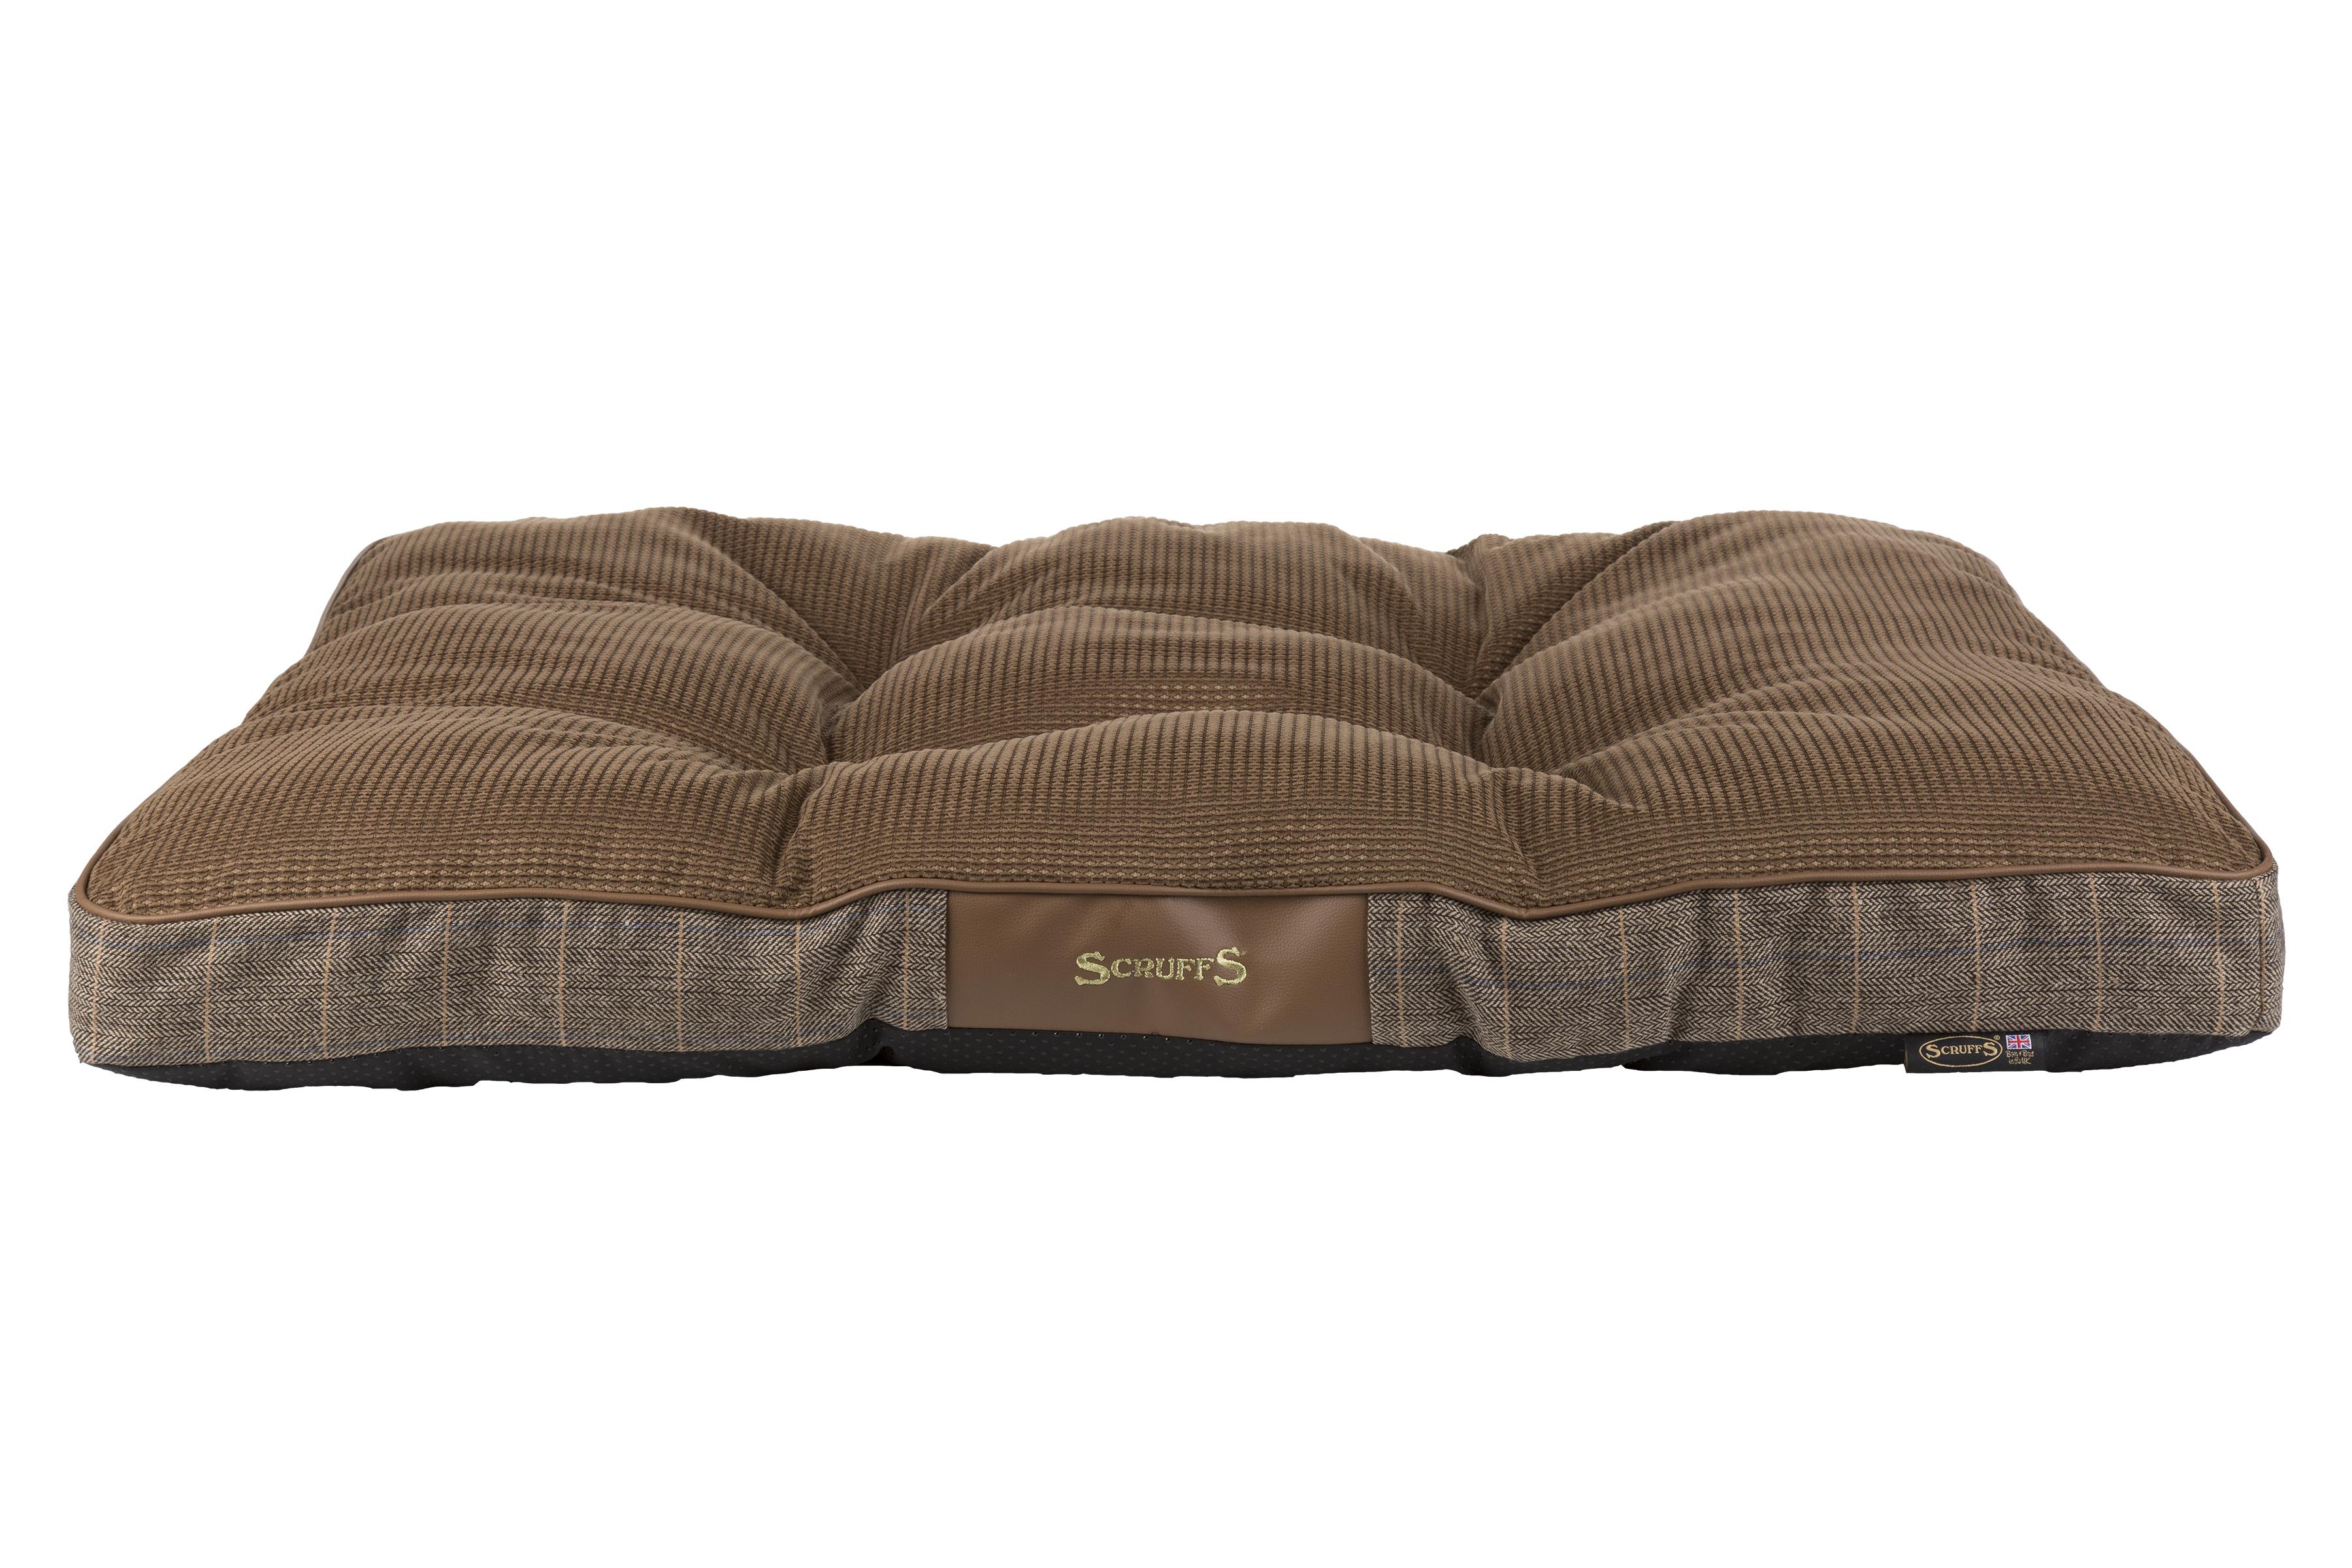 Матрас для собак Scruffs Windsor, коричневый, 100 x 70 х 7,5 см фото